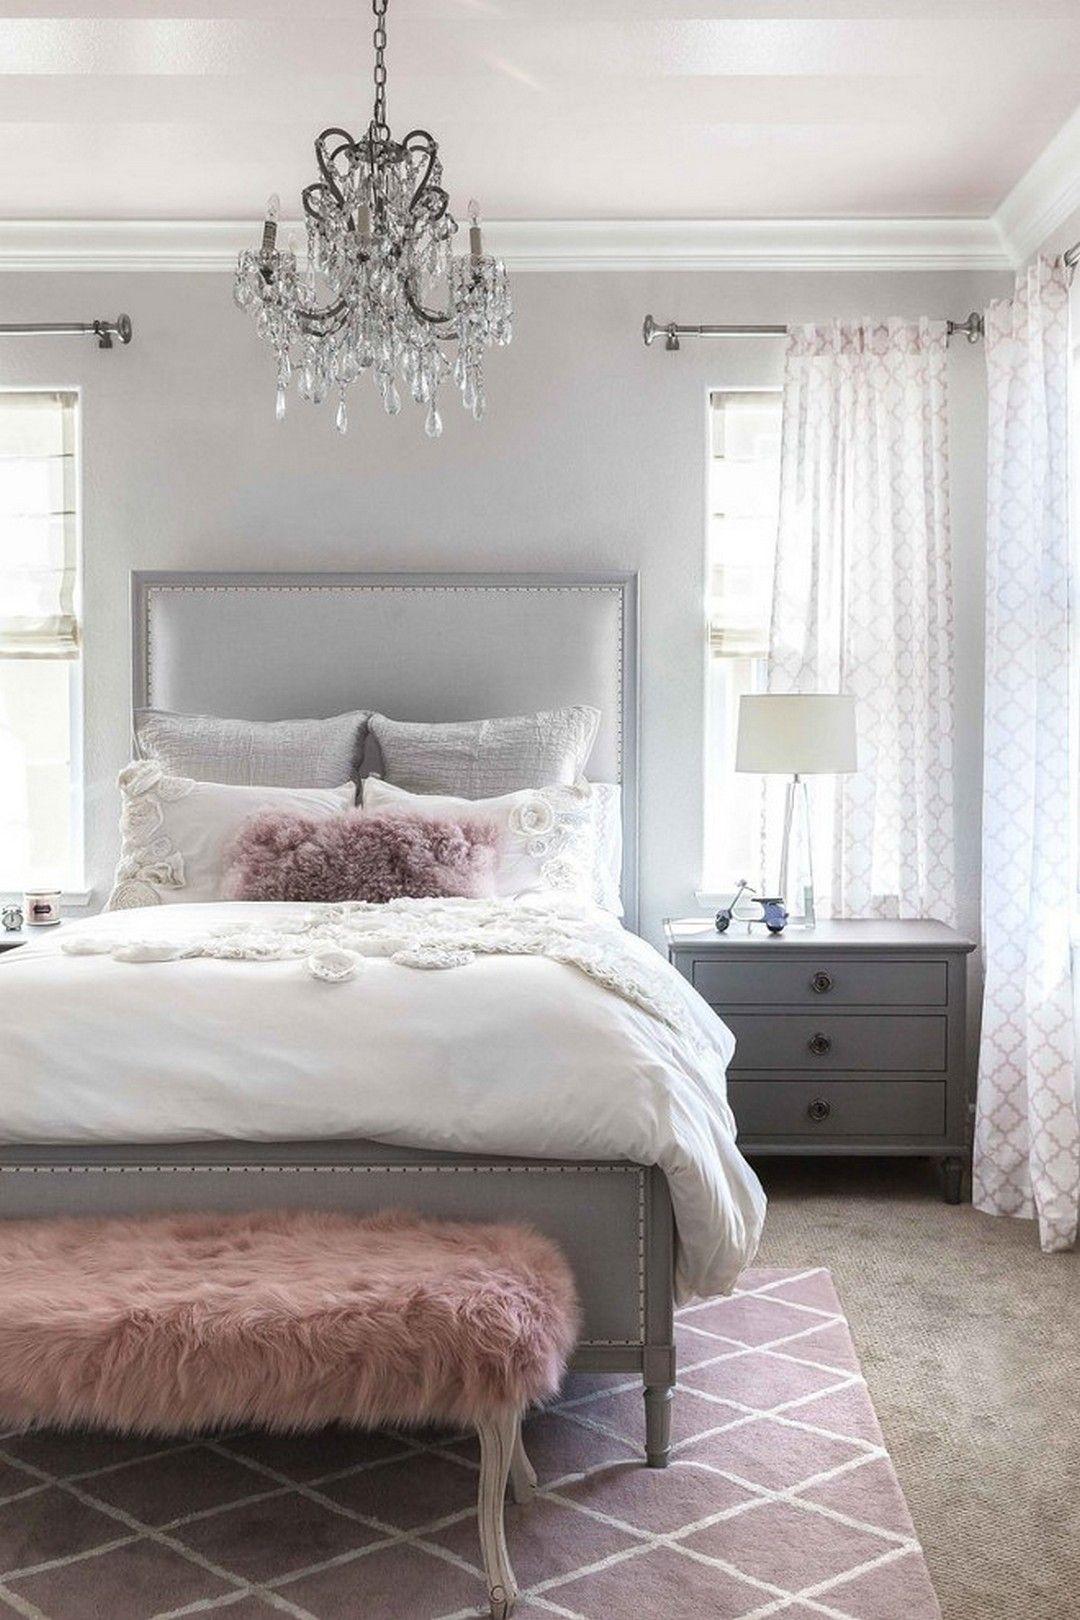 99 White And Grey Master Bedroom Interior Design 99architecture Gray Master Bedroom Bedroom Interior Master Bedroom Interior Design